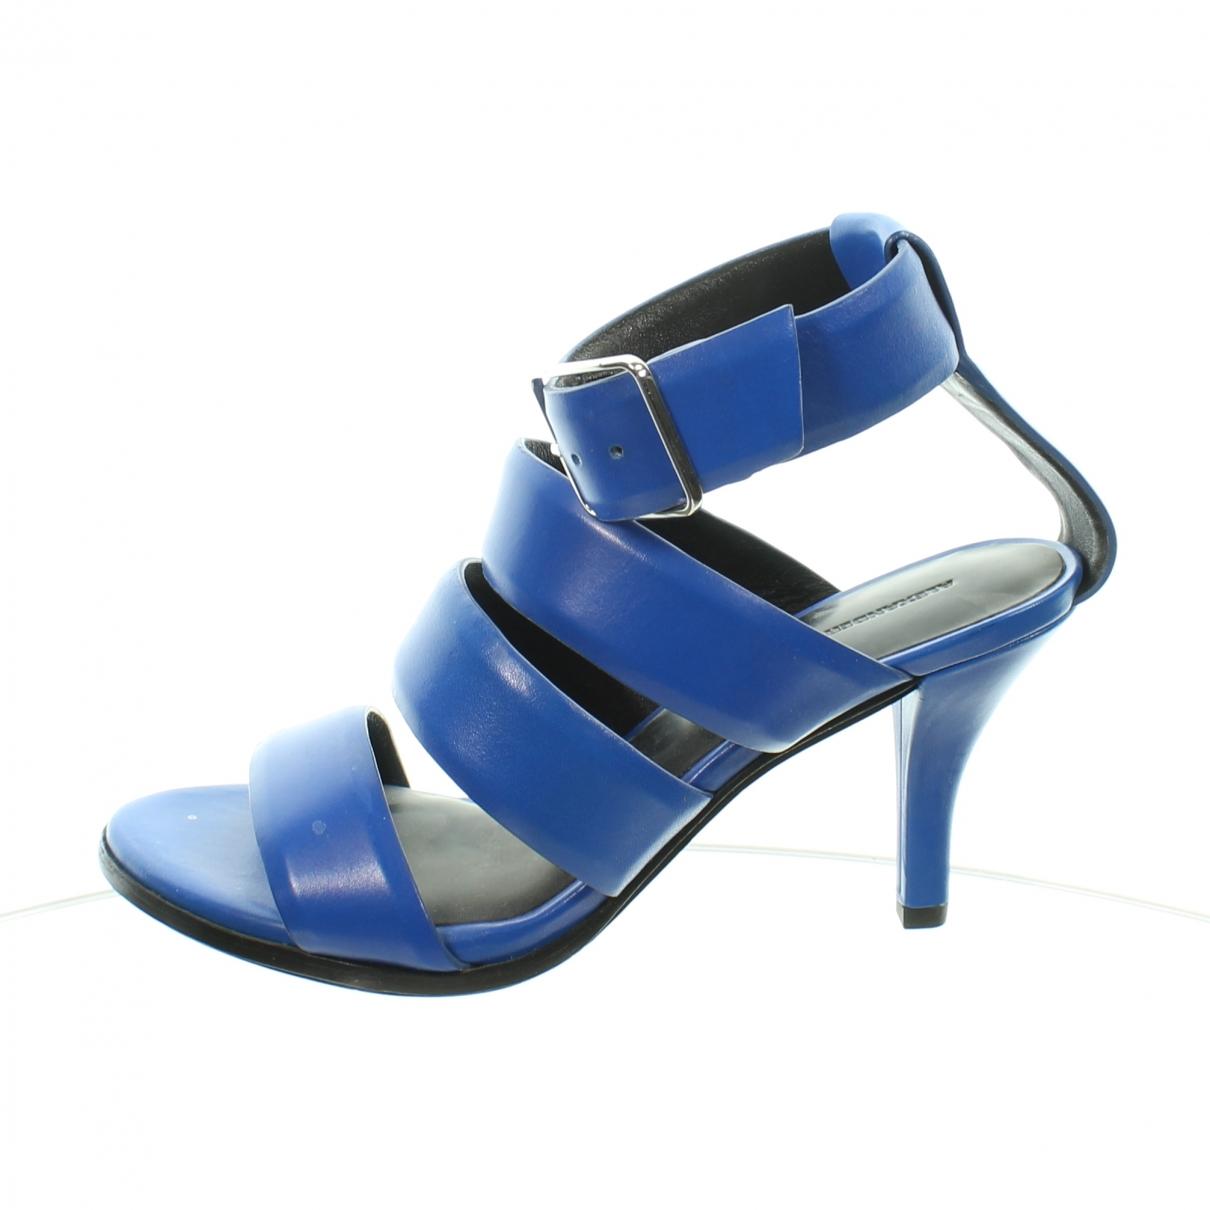 Alexander Wang - Sandales   pour femme en cuir - bleu